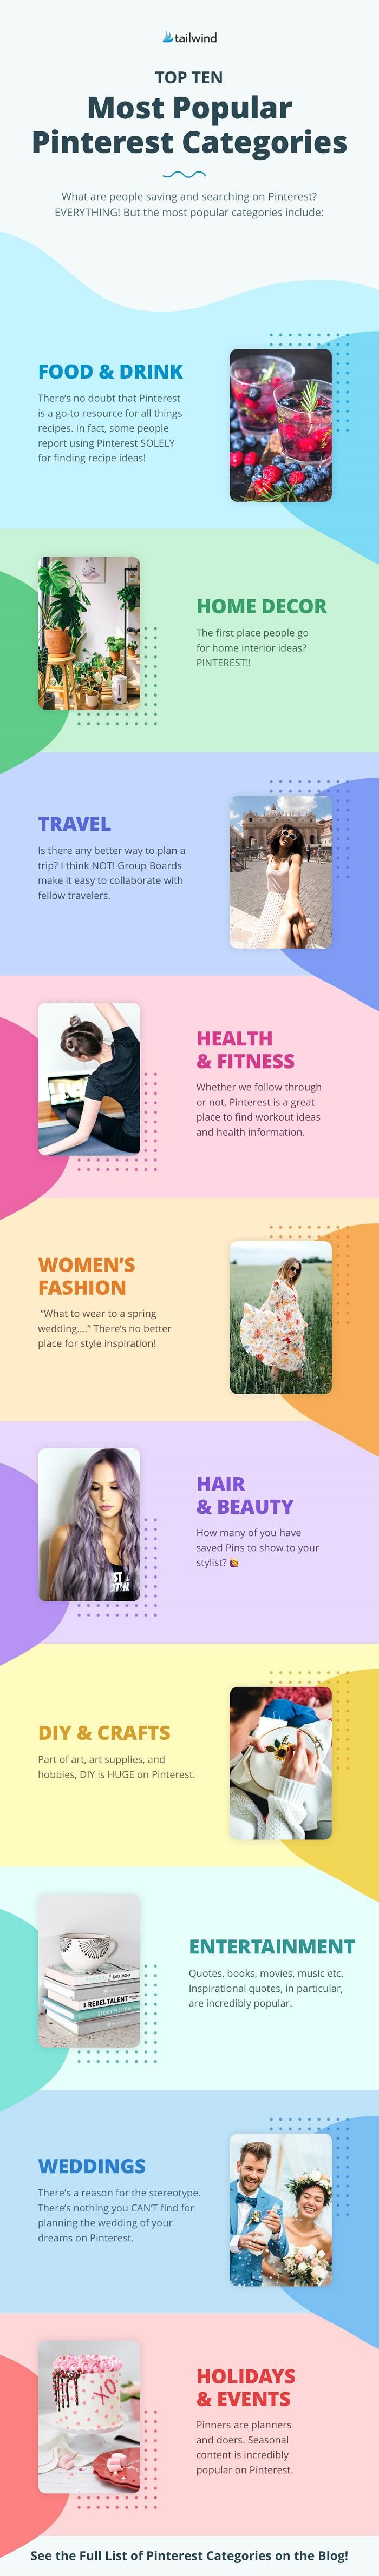 Pinterest topics